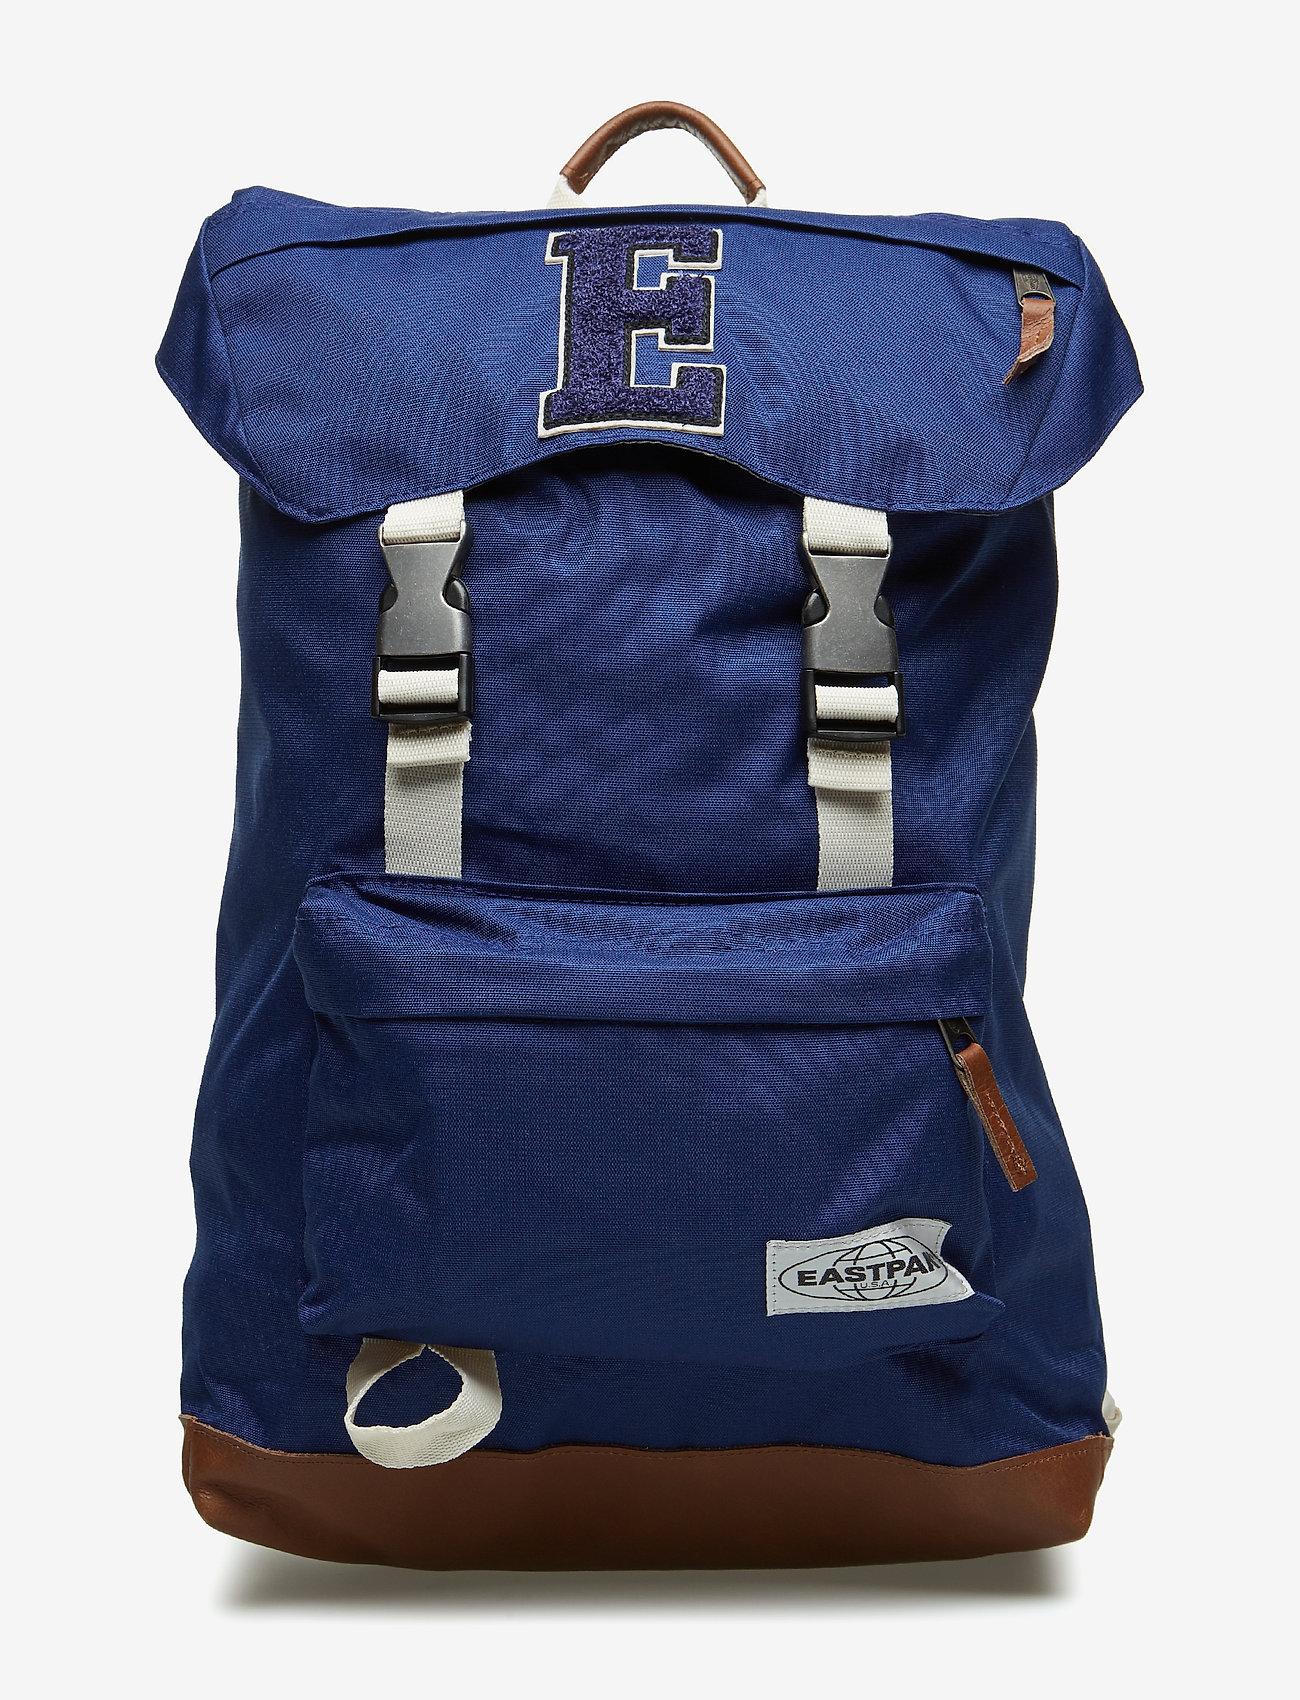 Eastpak - ROWLO - backpacks - into e